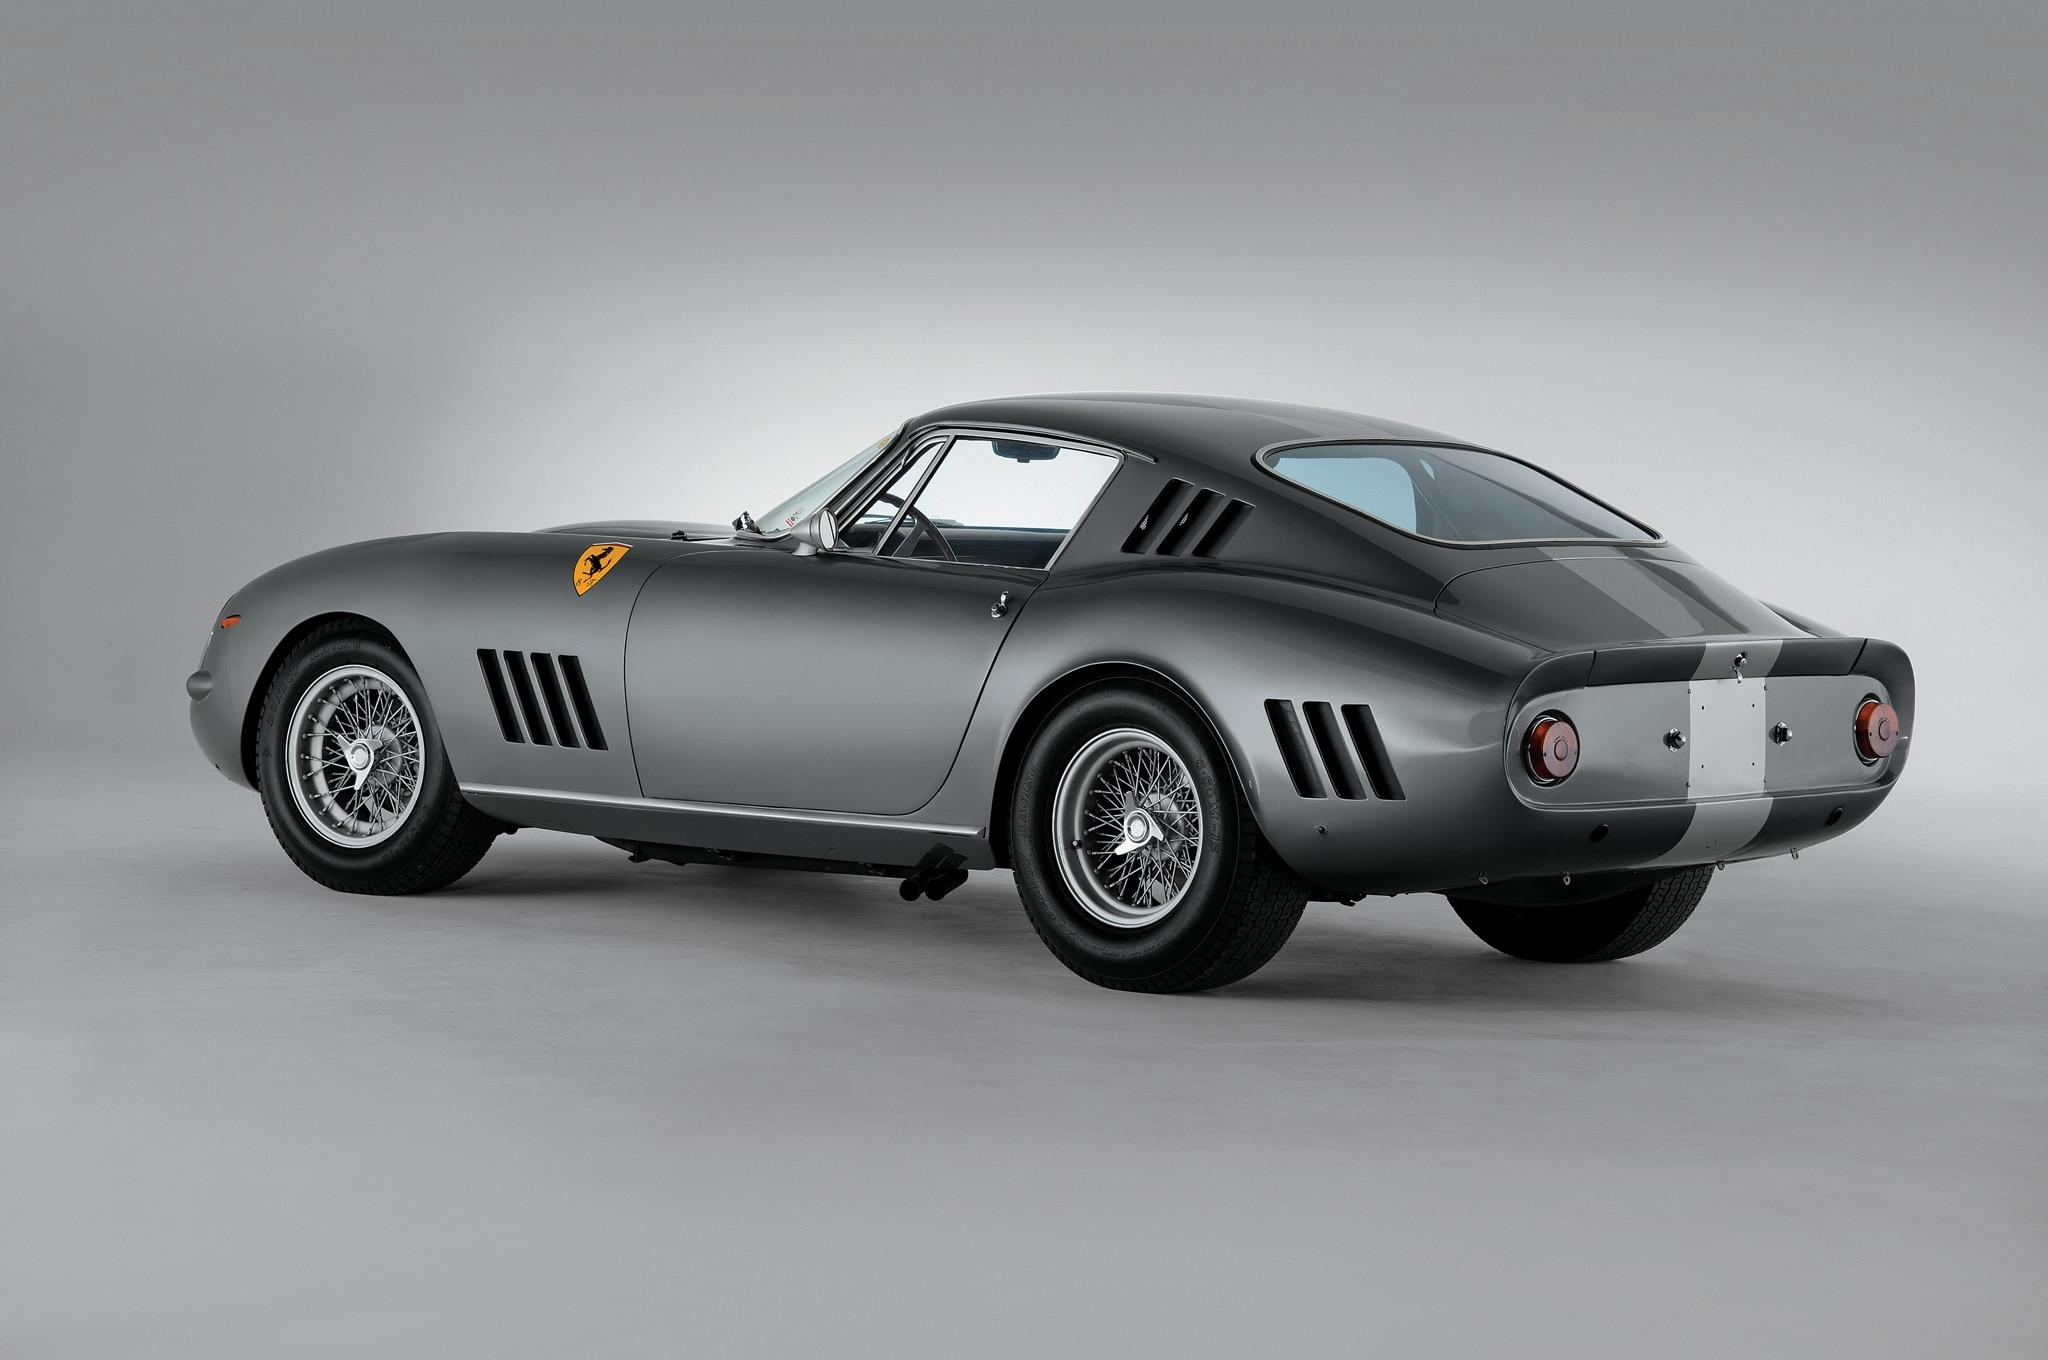 1964 Ferrari 275 Gtb C Speciale 02 Rear Three Quarter1